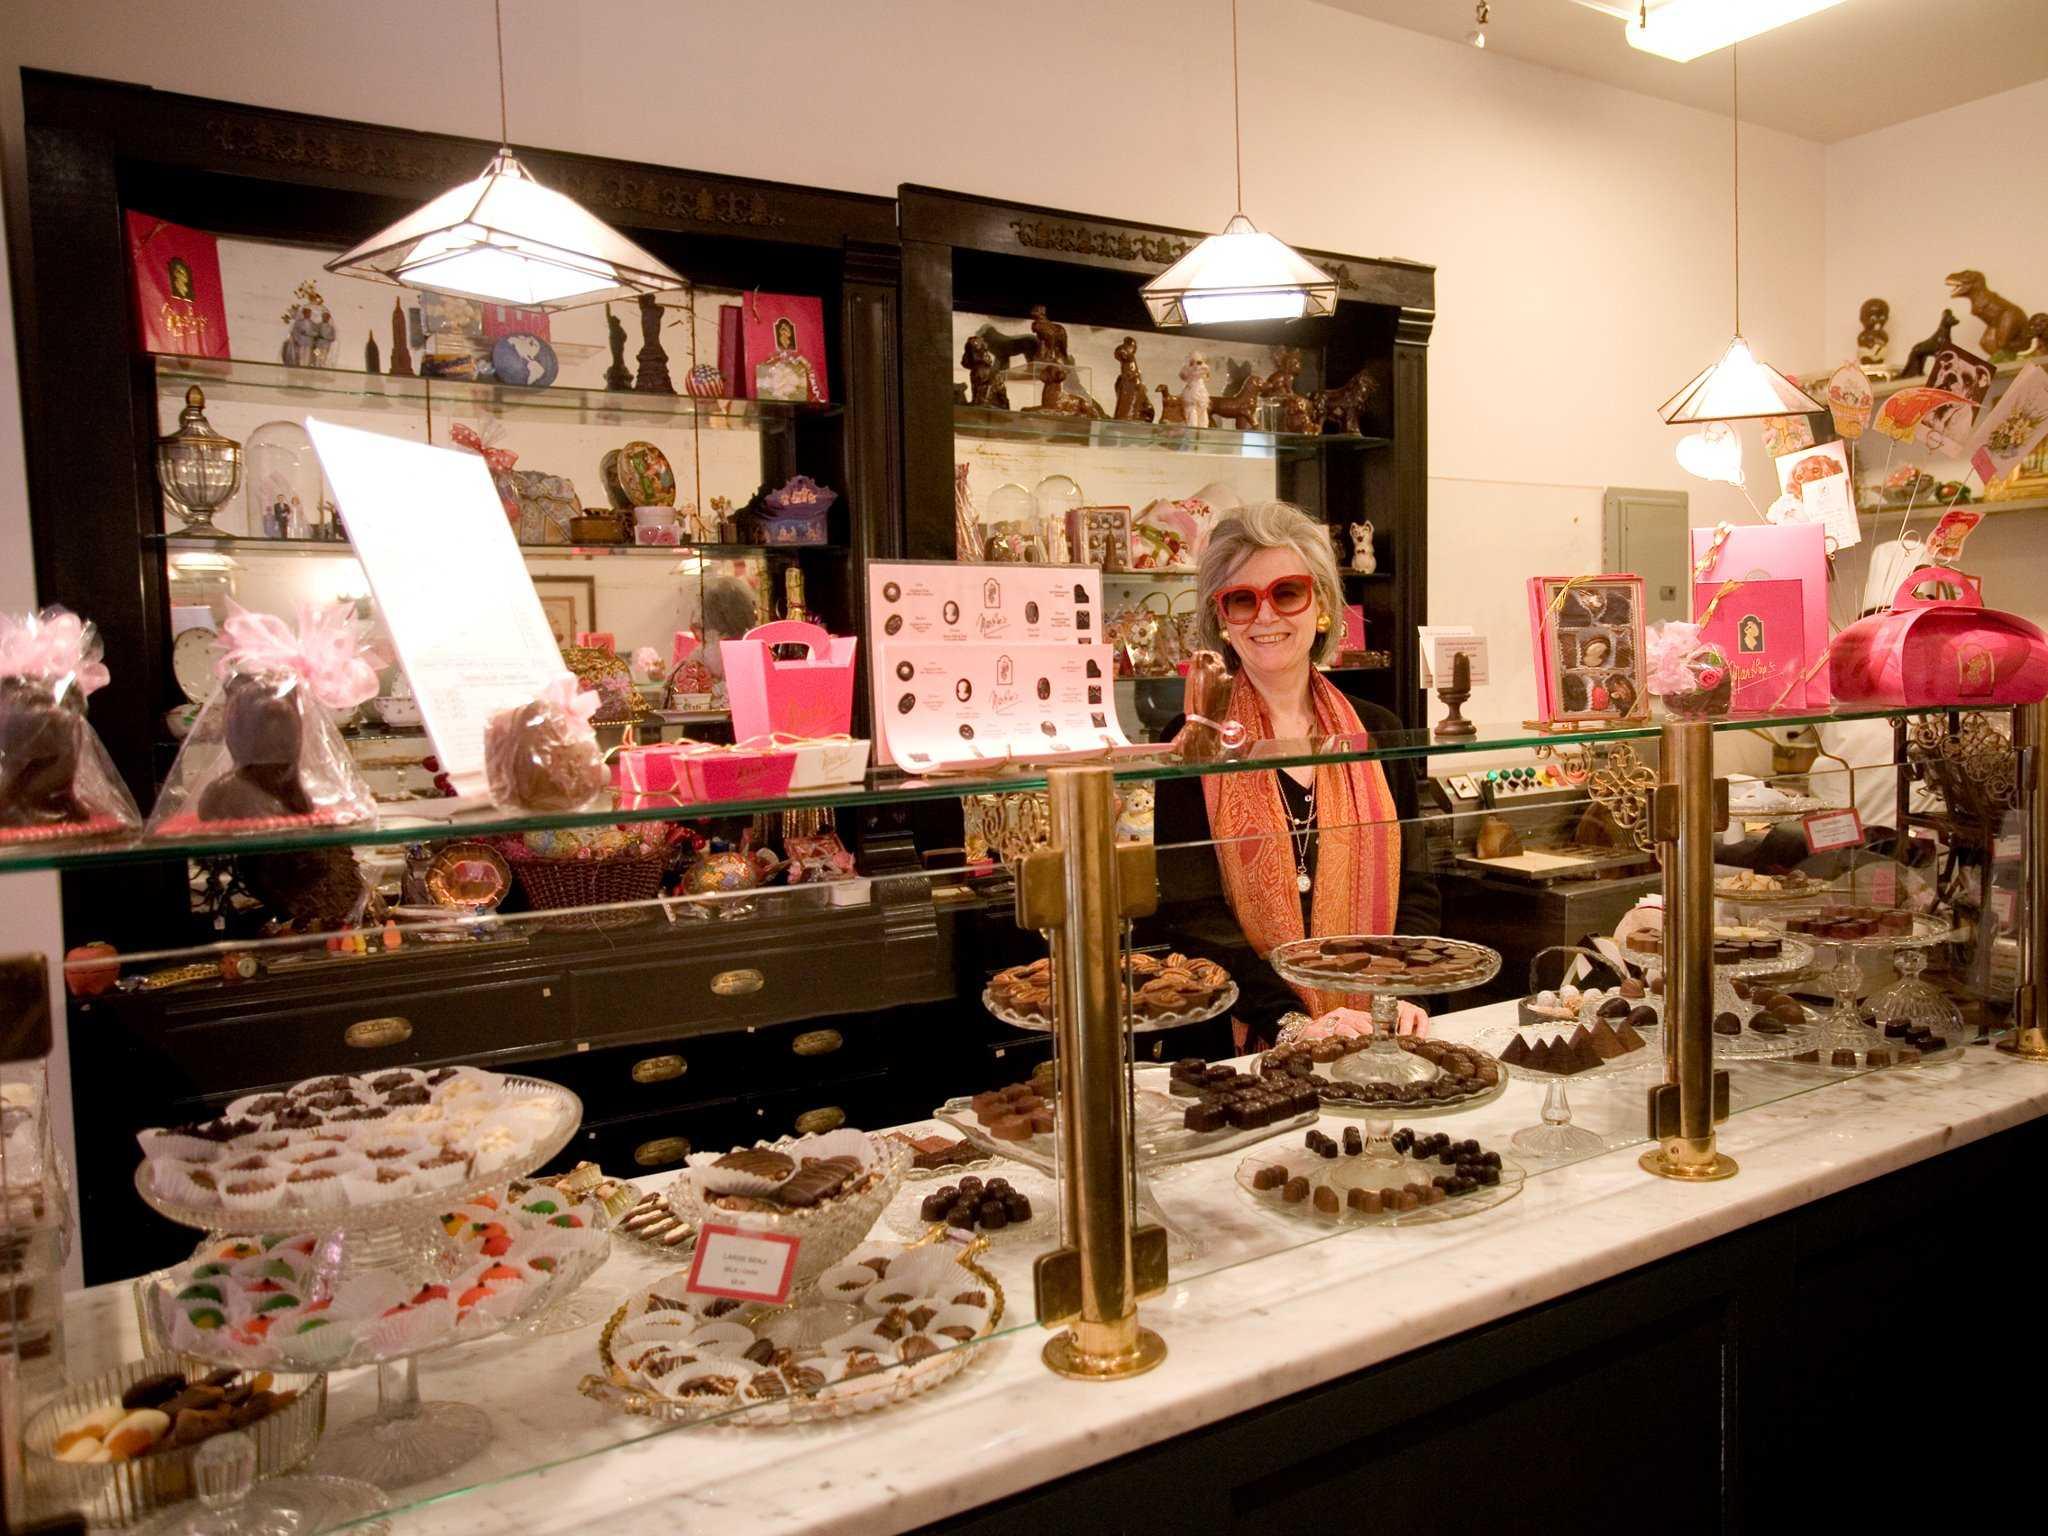 шоколадный магазин Шоколад у Мартина Нью Йорк Martine's Chocolates